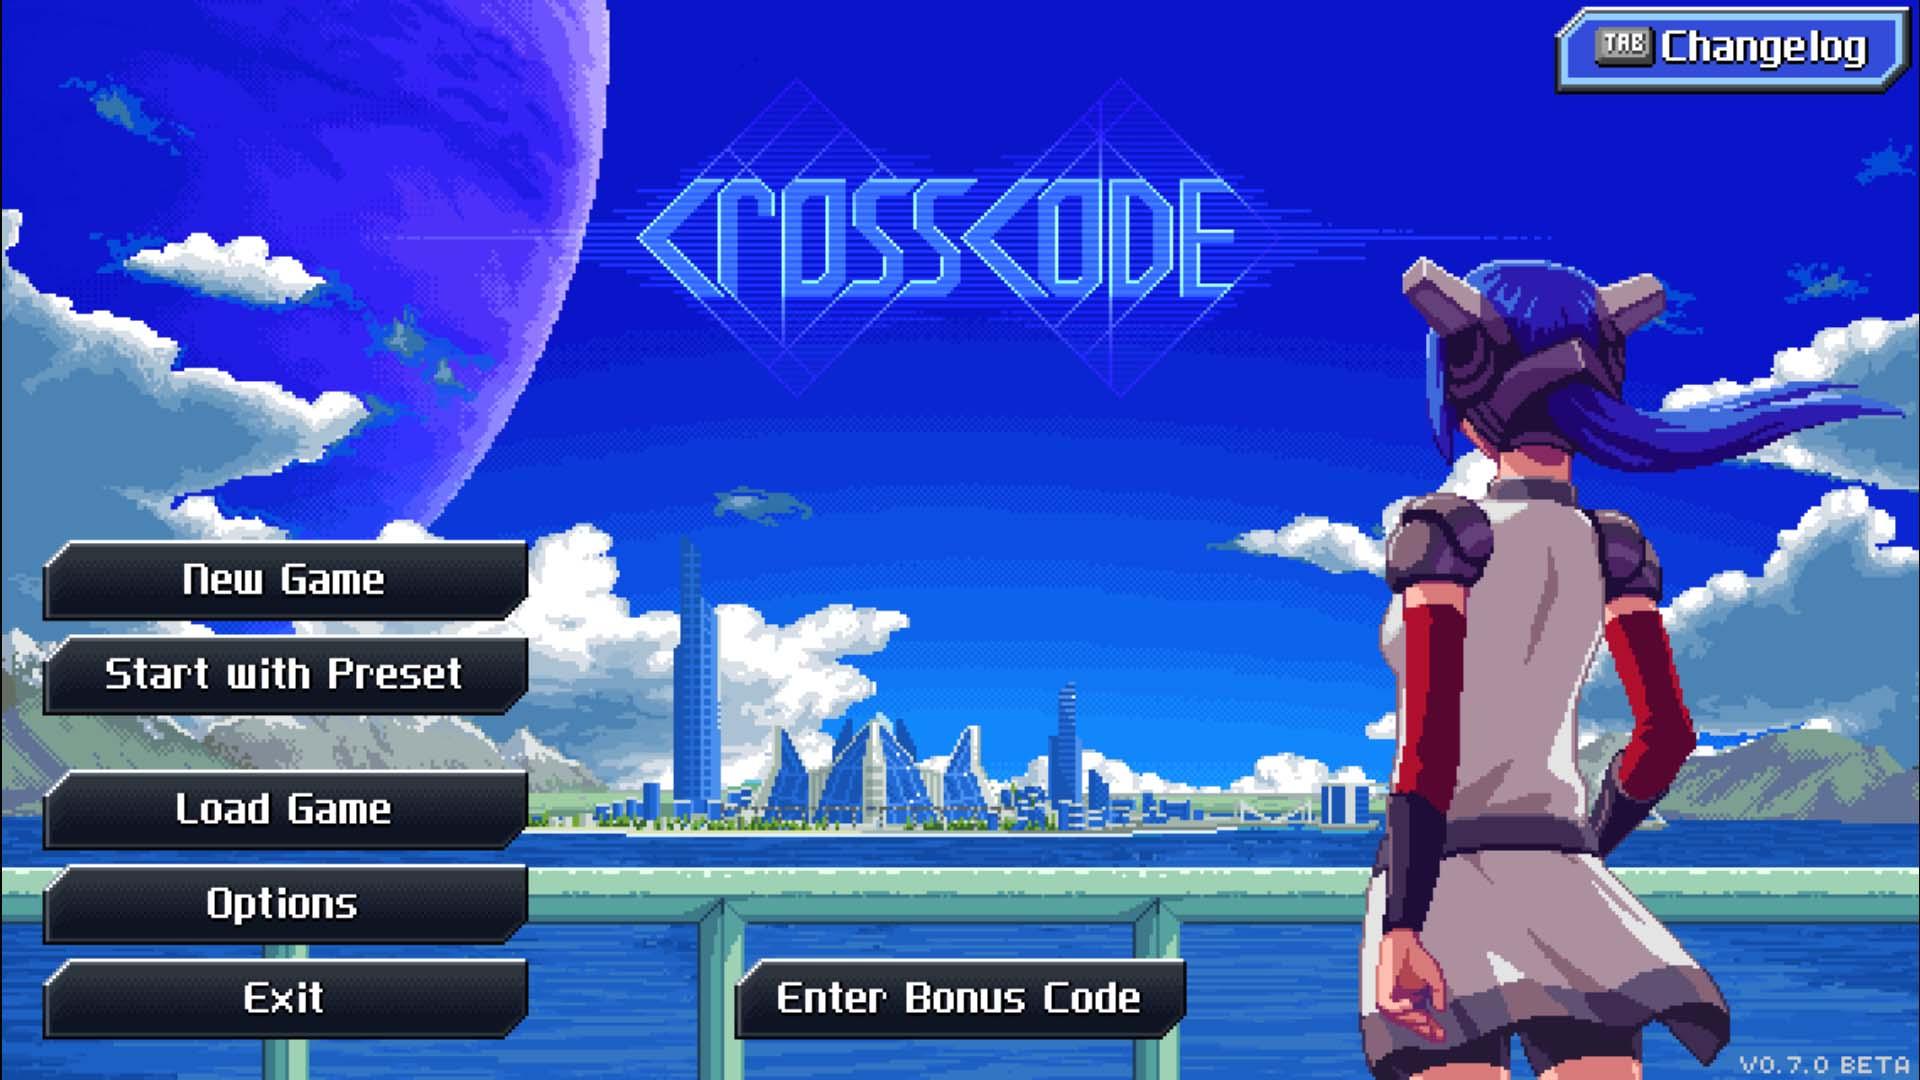 crosscode-beta 2016-06-21 21-43-57-62